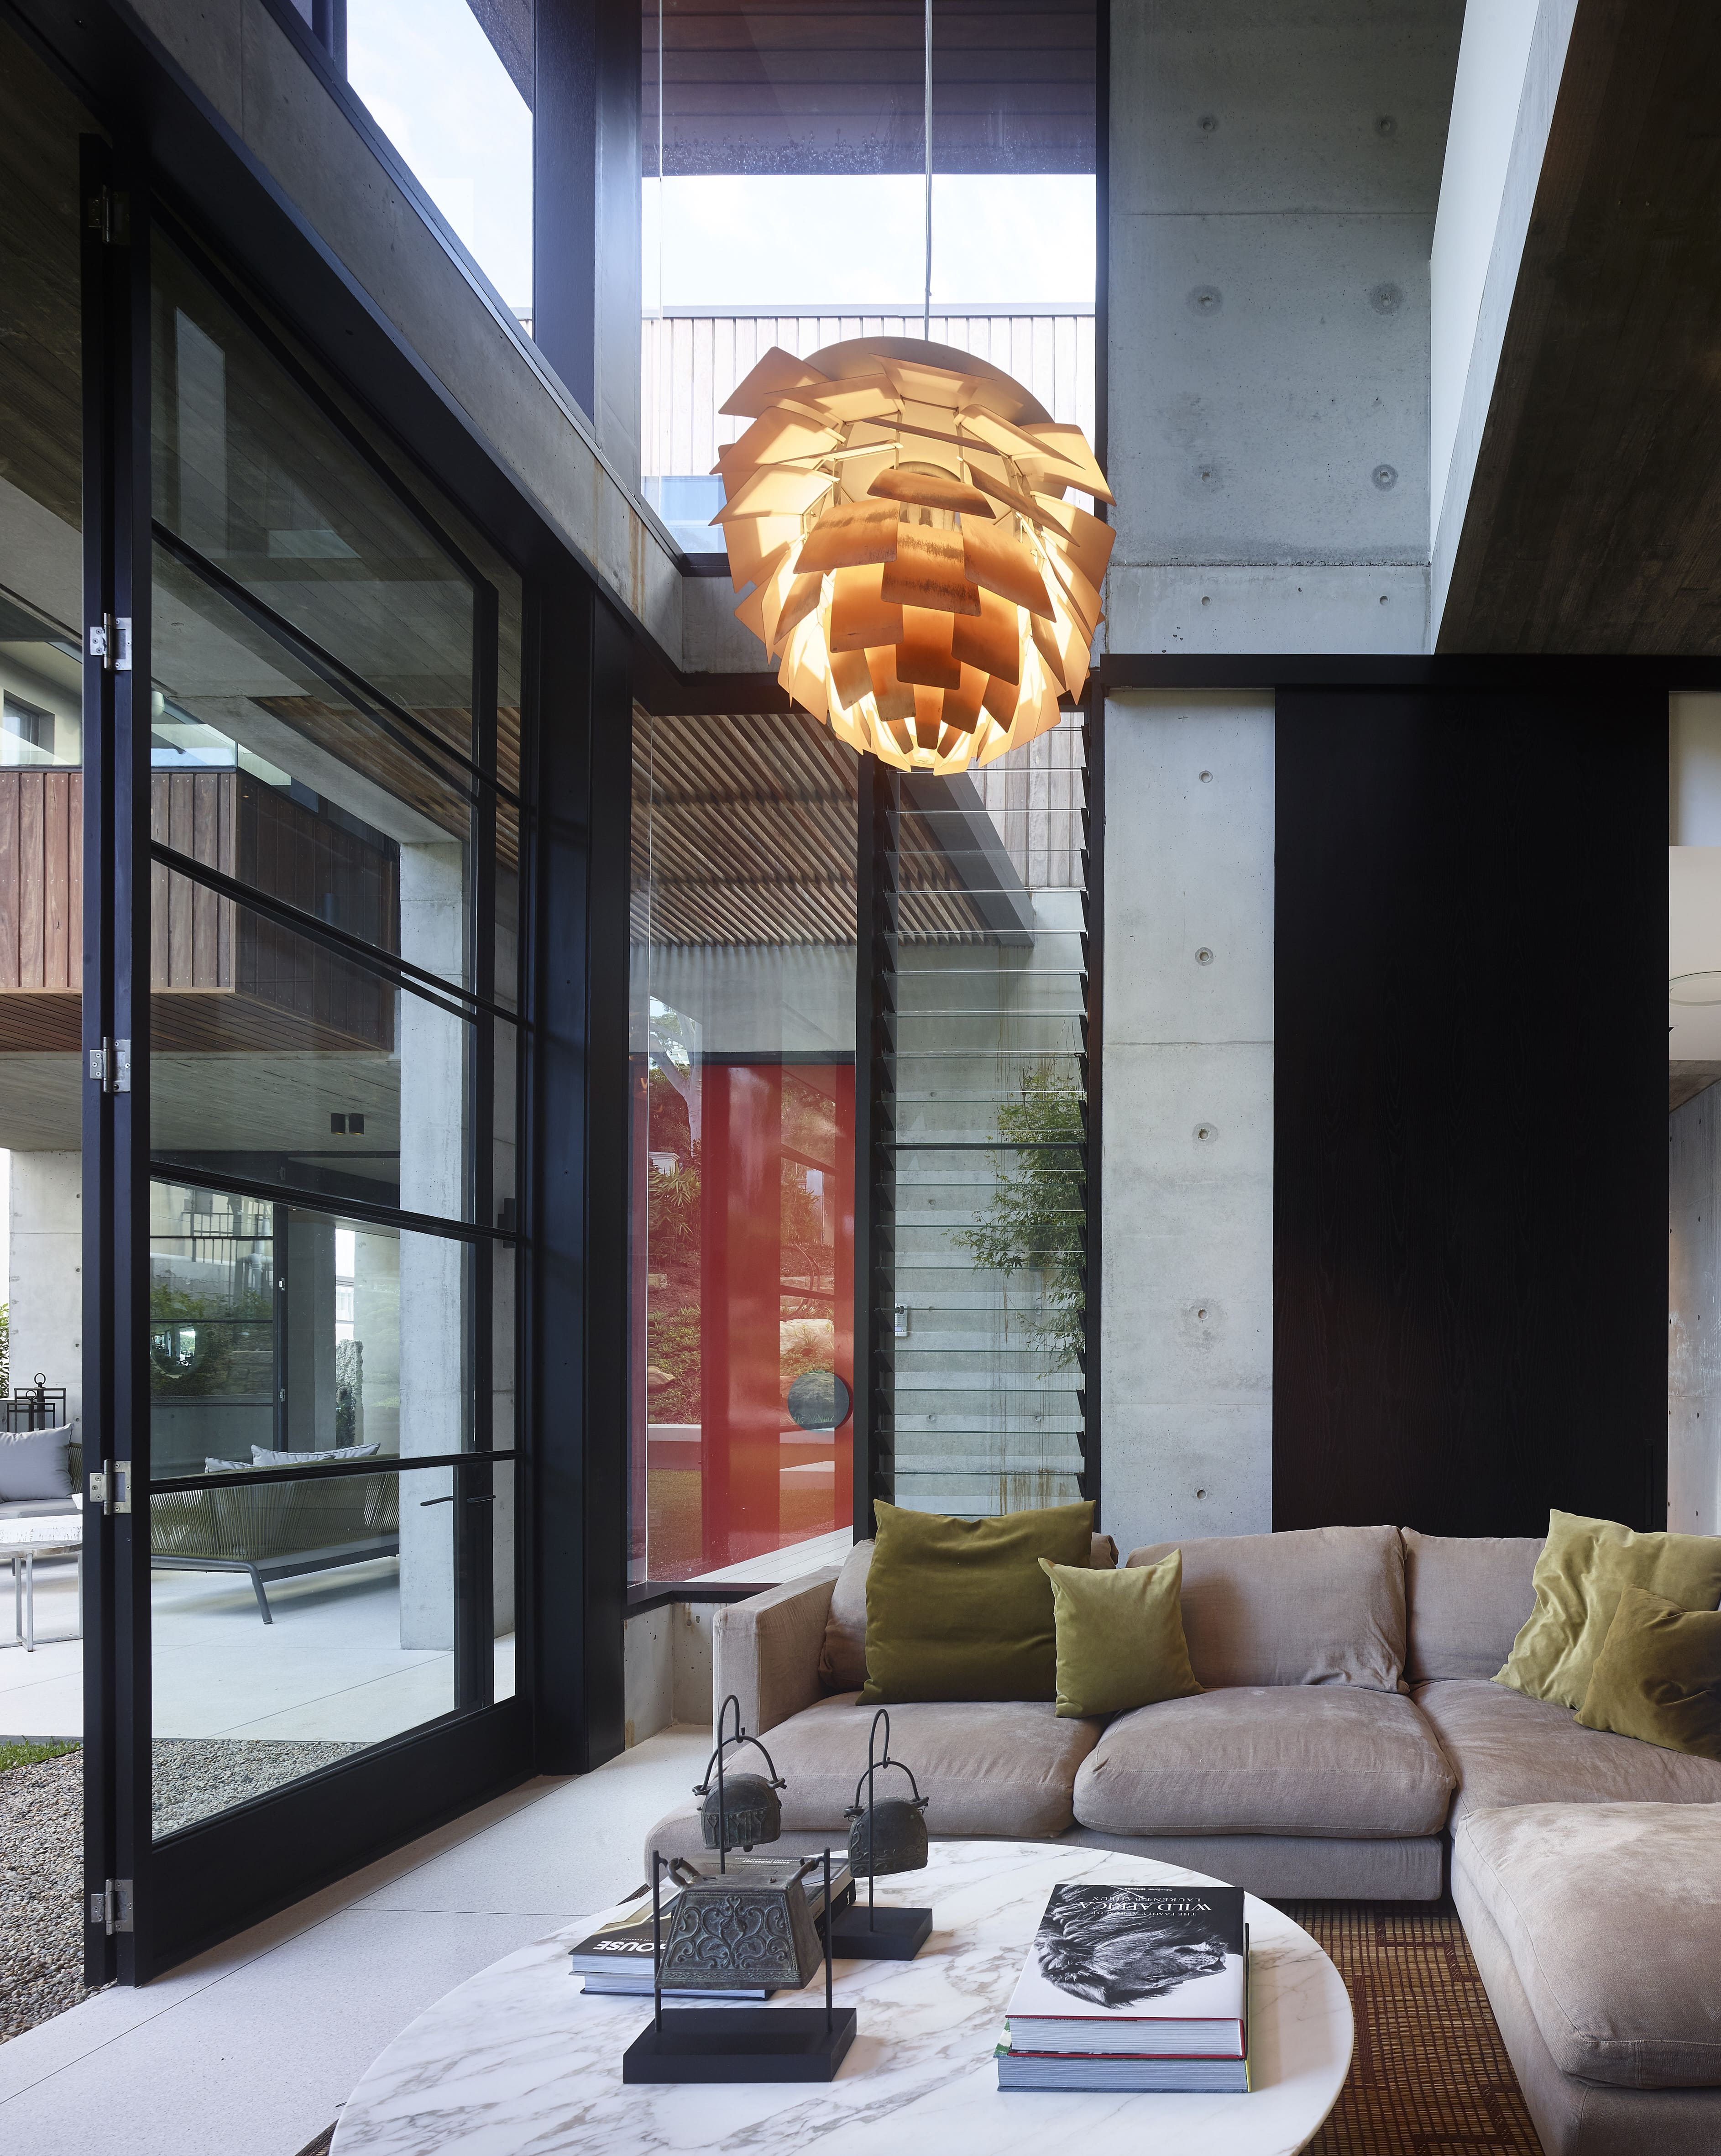 Gallery Of Mosman House By Shaun Lockyer Architects Local Australian Design And Interiors Mosman, Nsw Image 14 Min